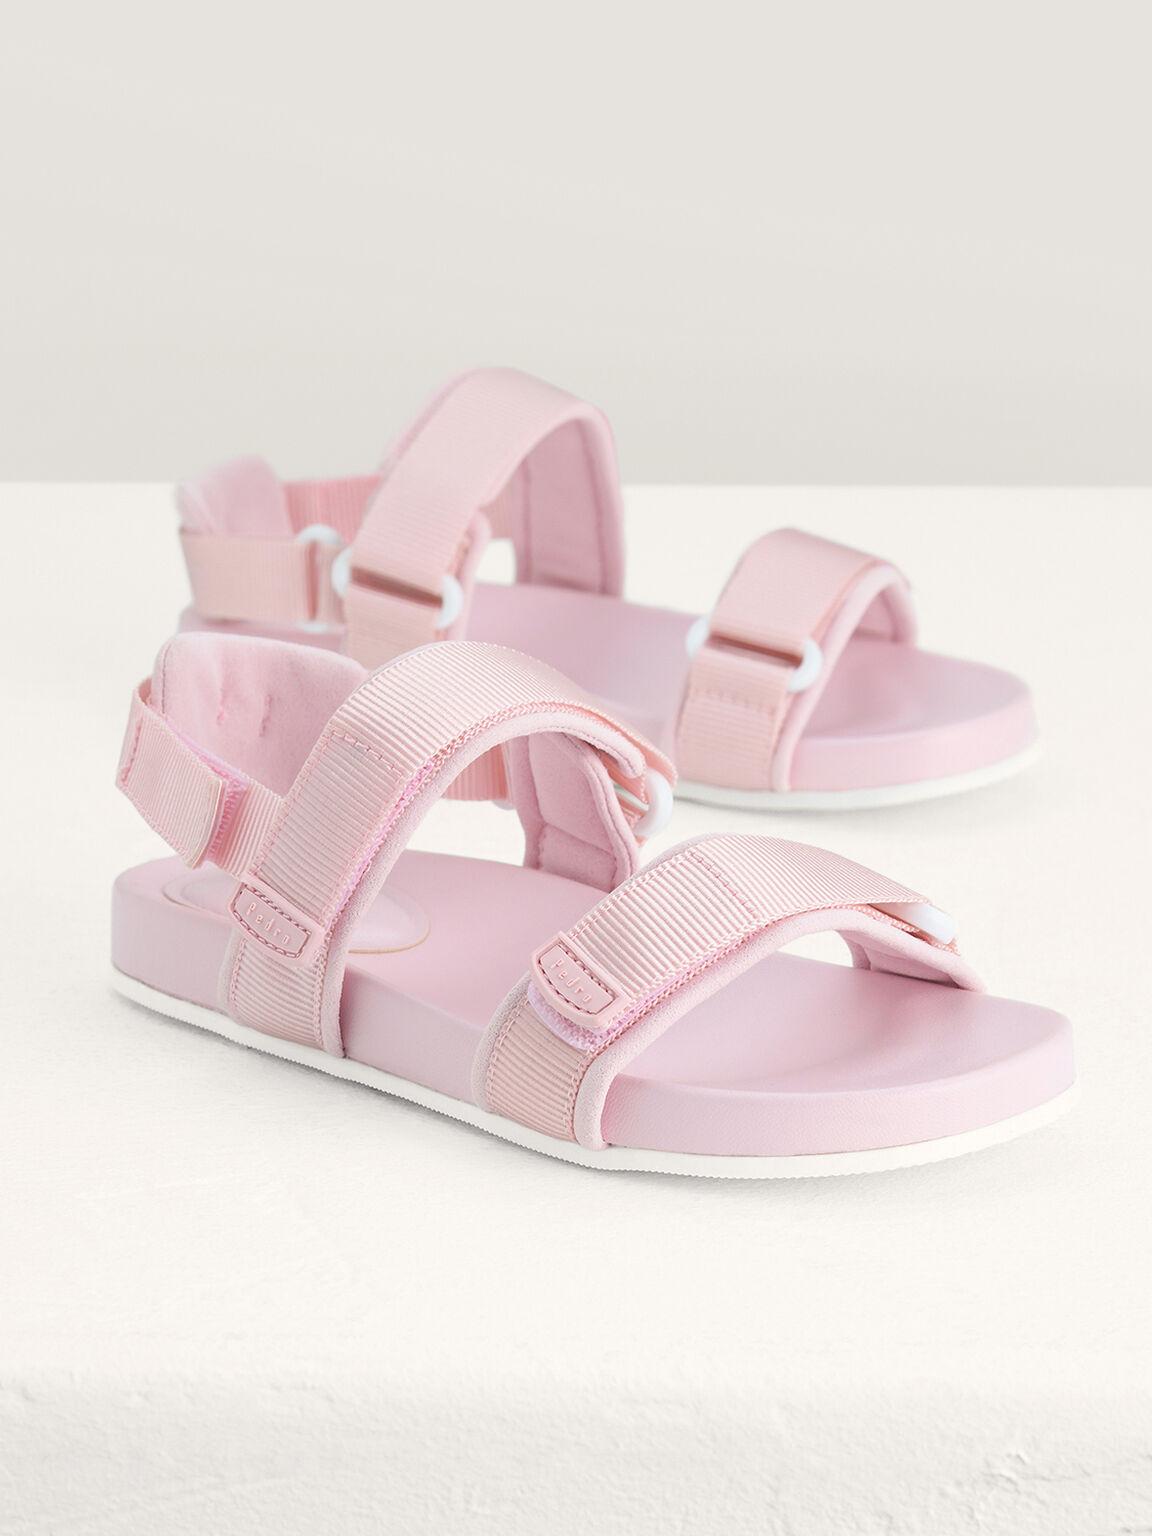 Monochrome Sandals, Light Pink, hi-res